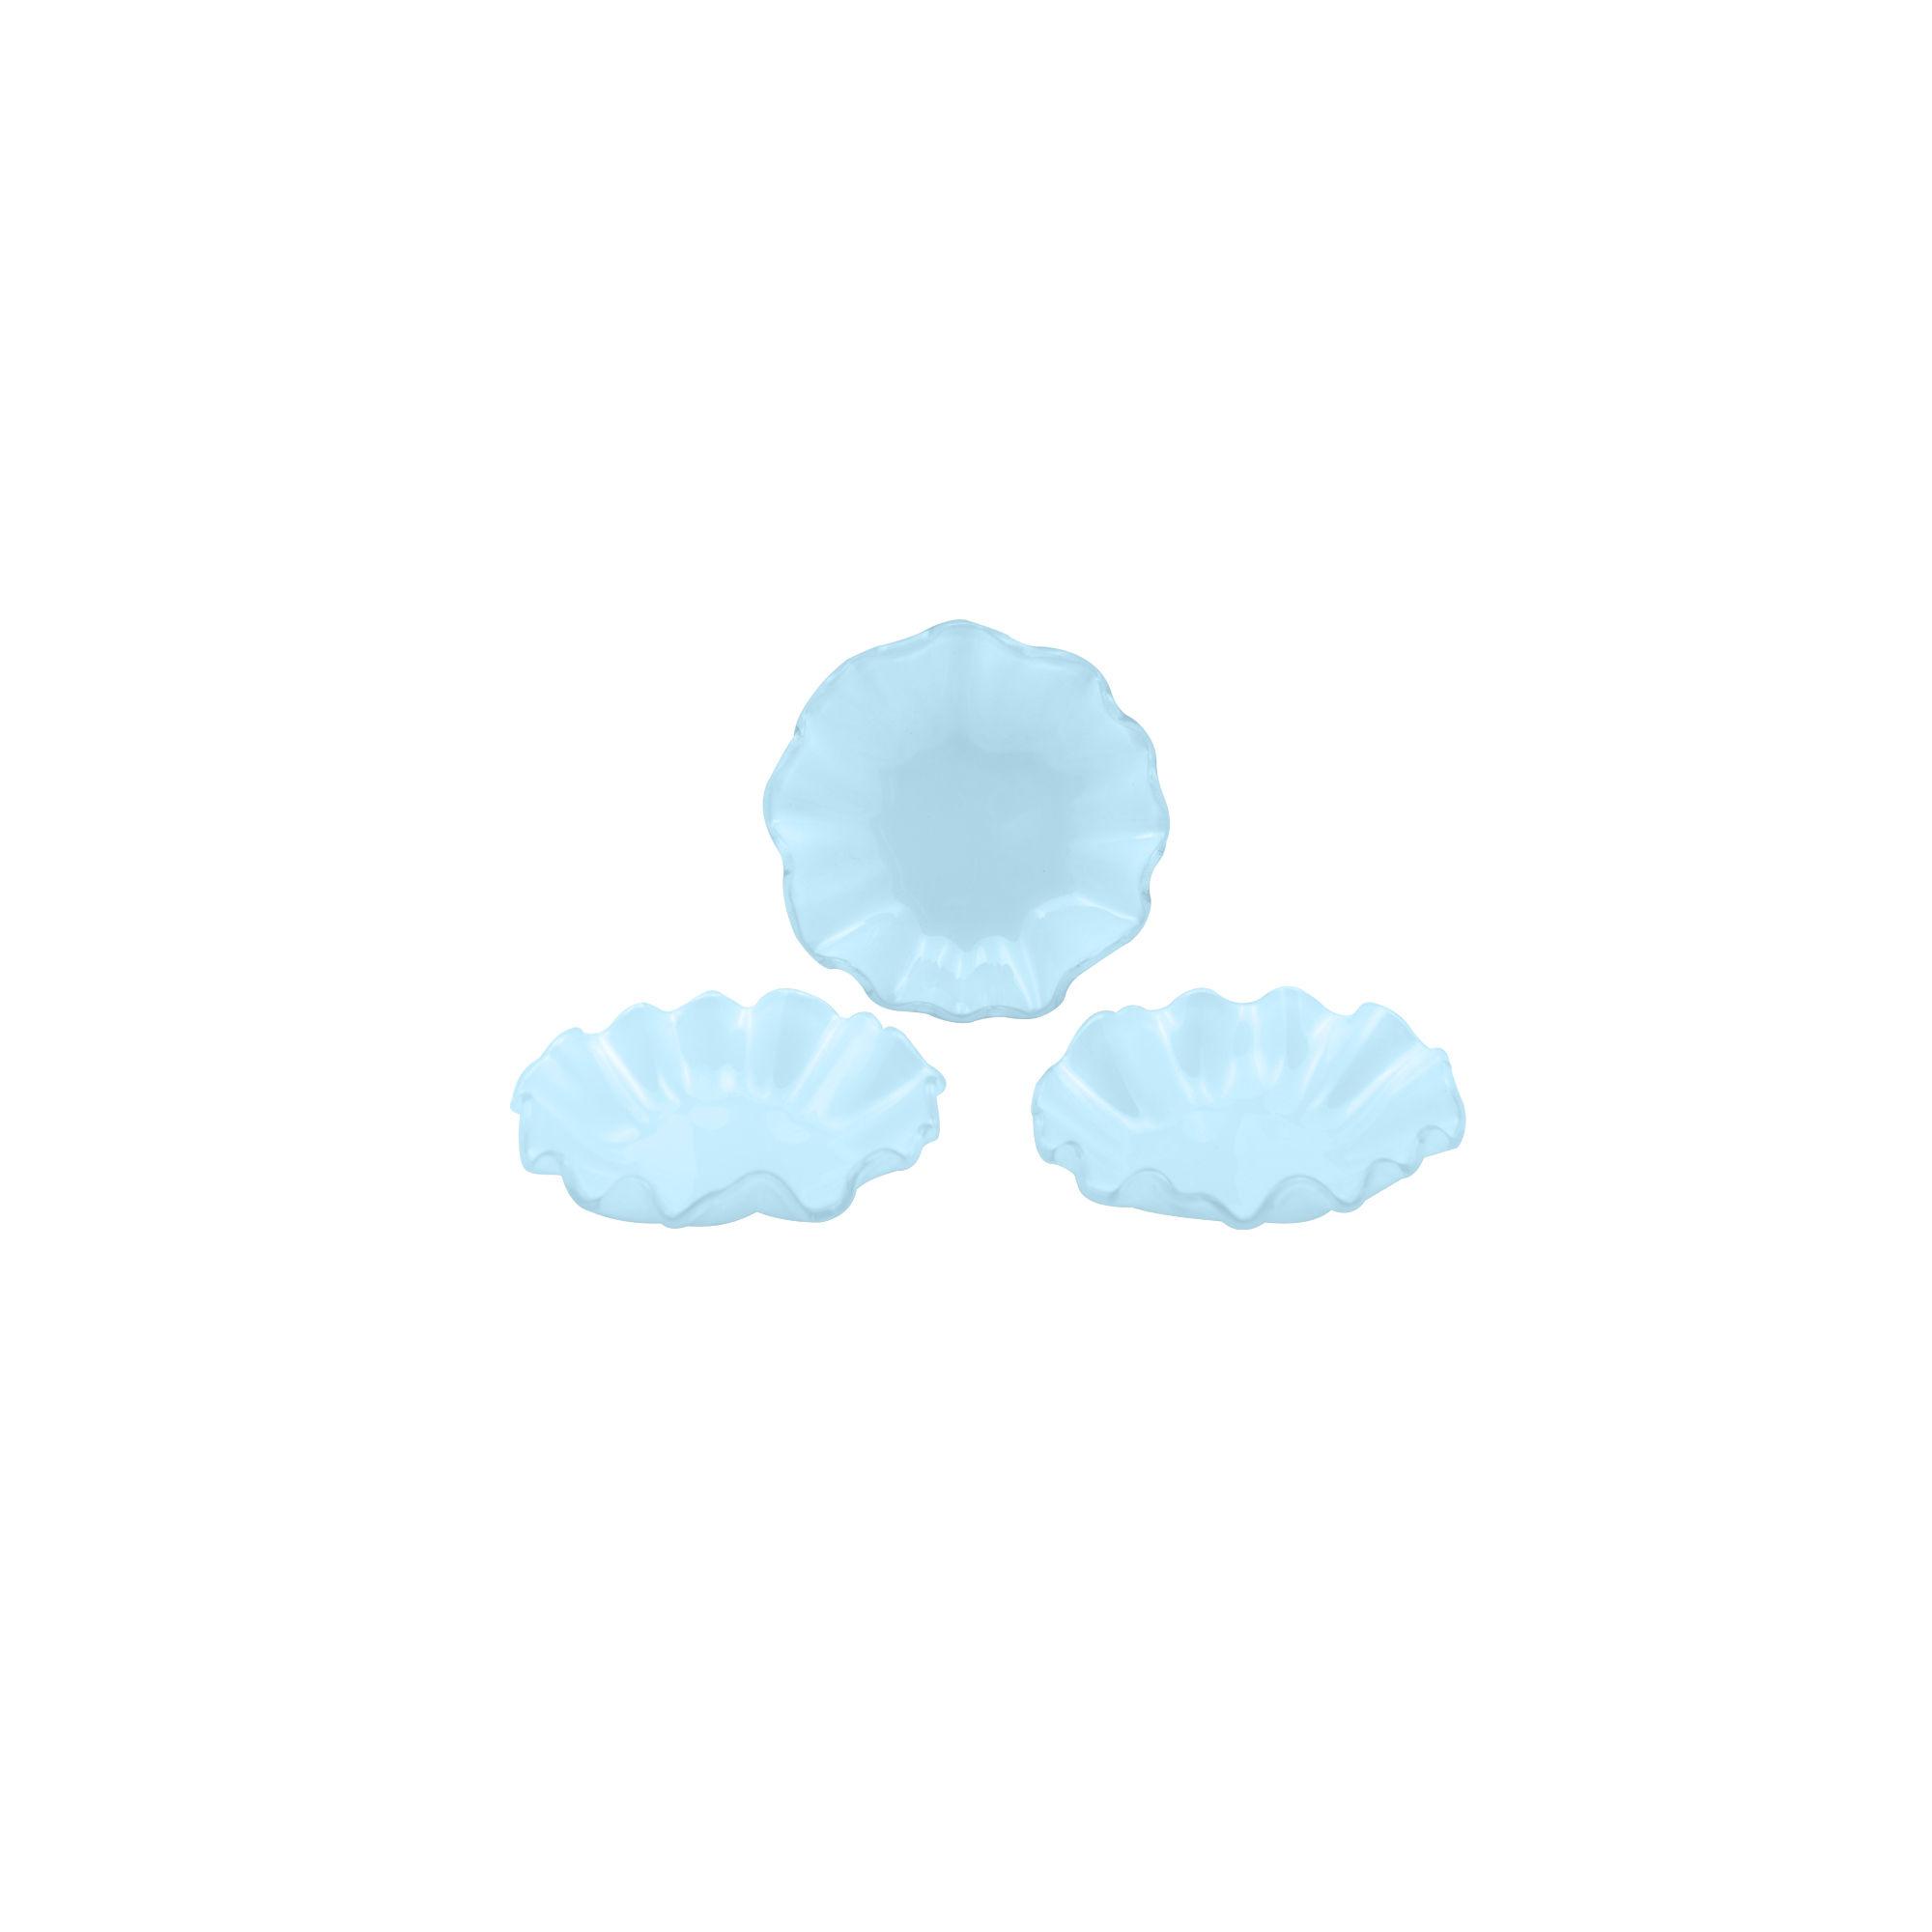 Conjunto 03 bowls pequeno de vidro azul